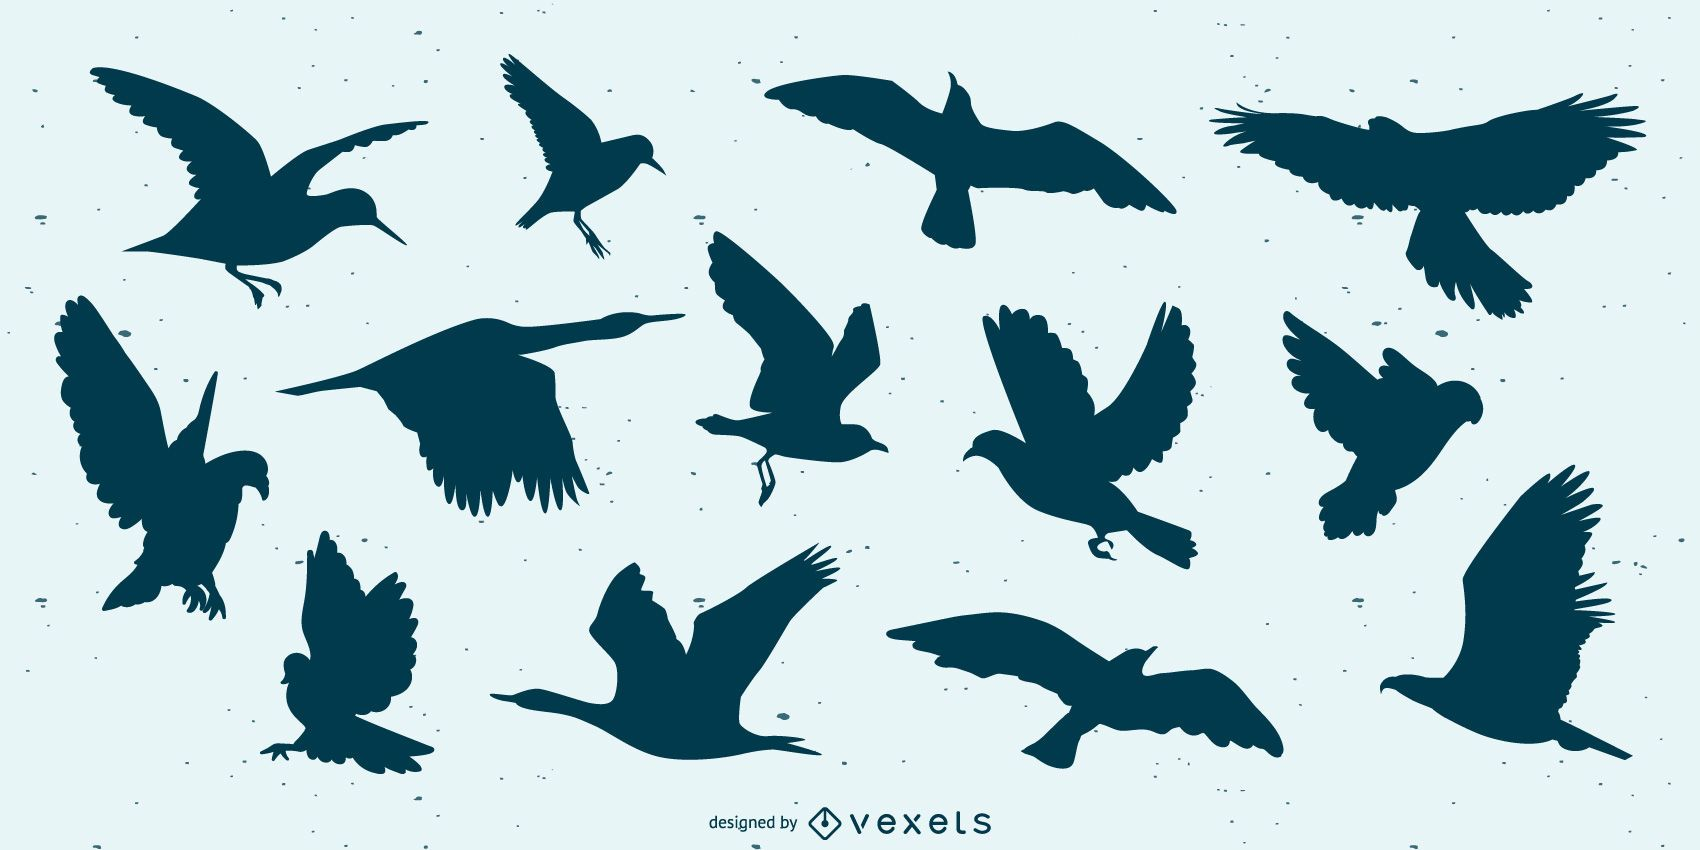 fliegender vogel comic